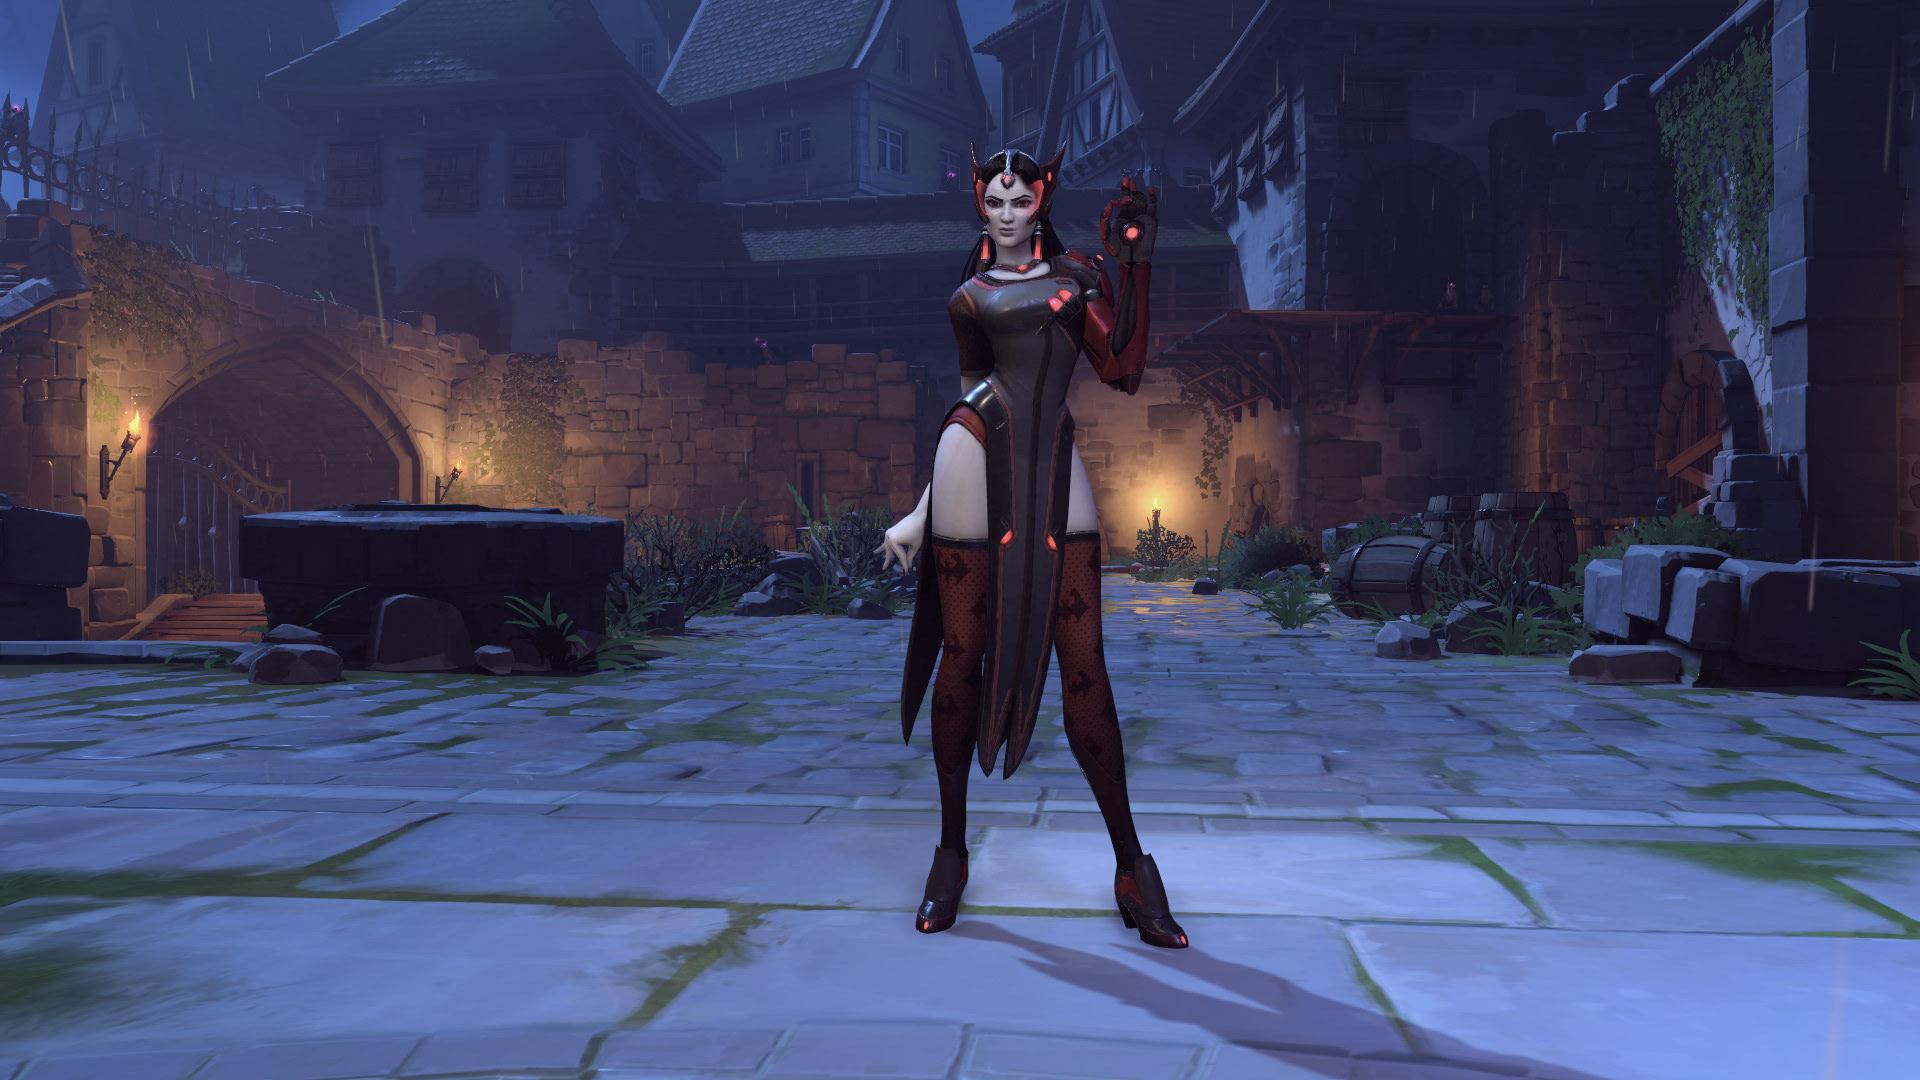 Symmetra Overwatch Halloween Skin